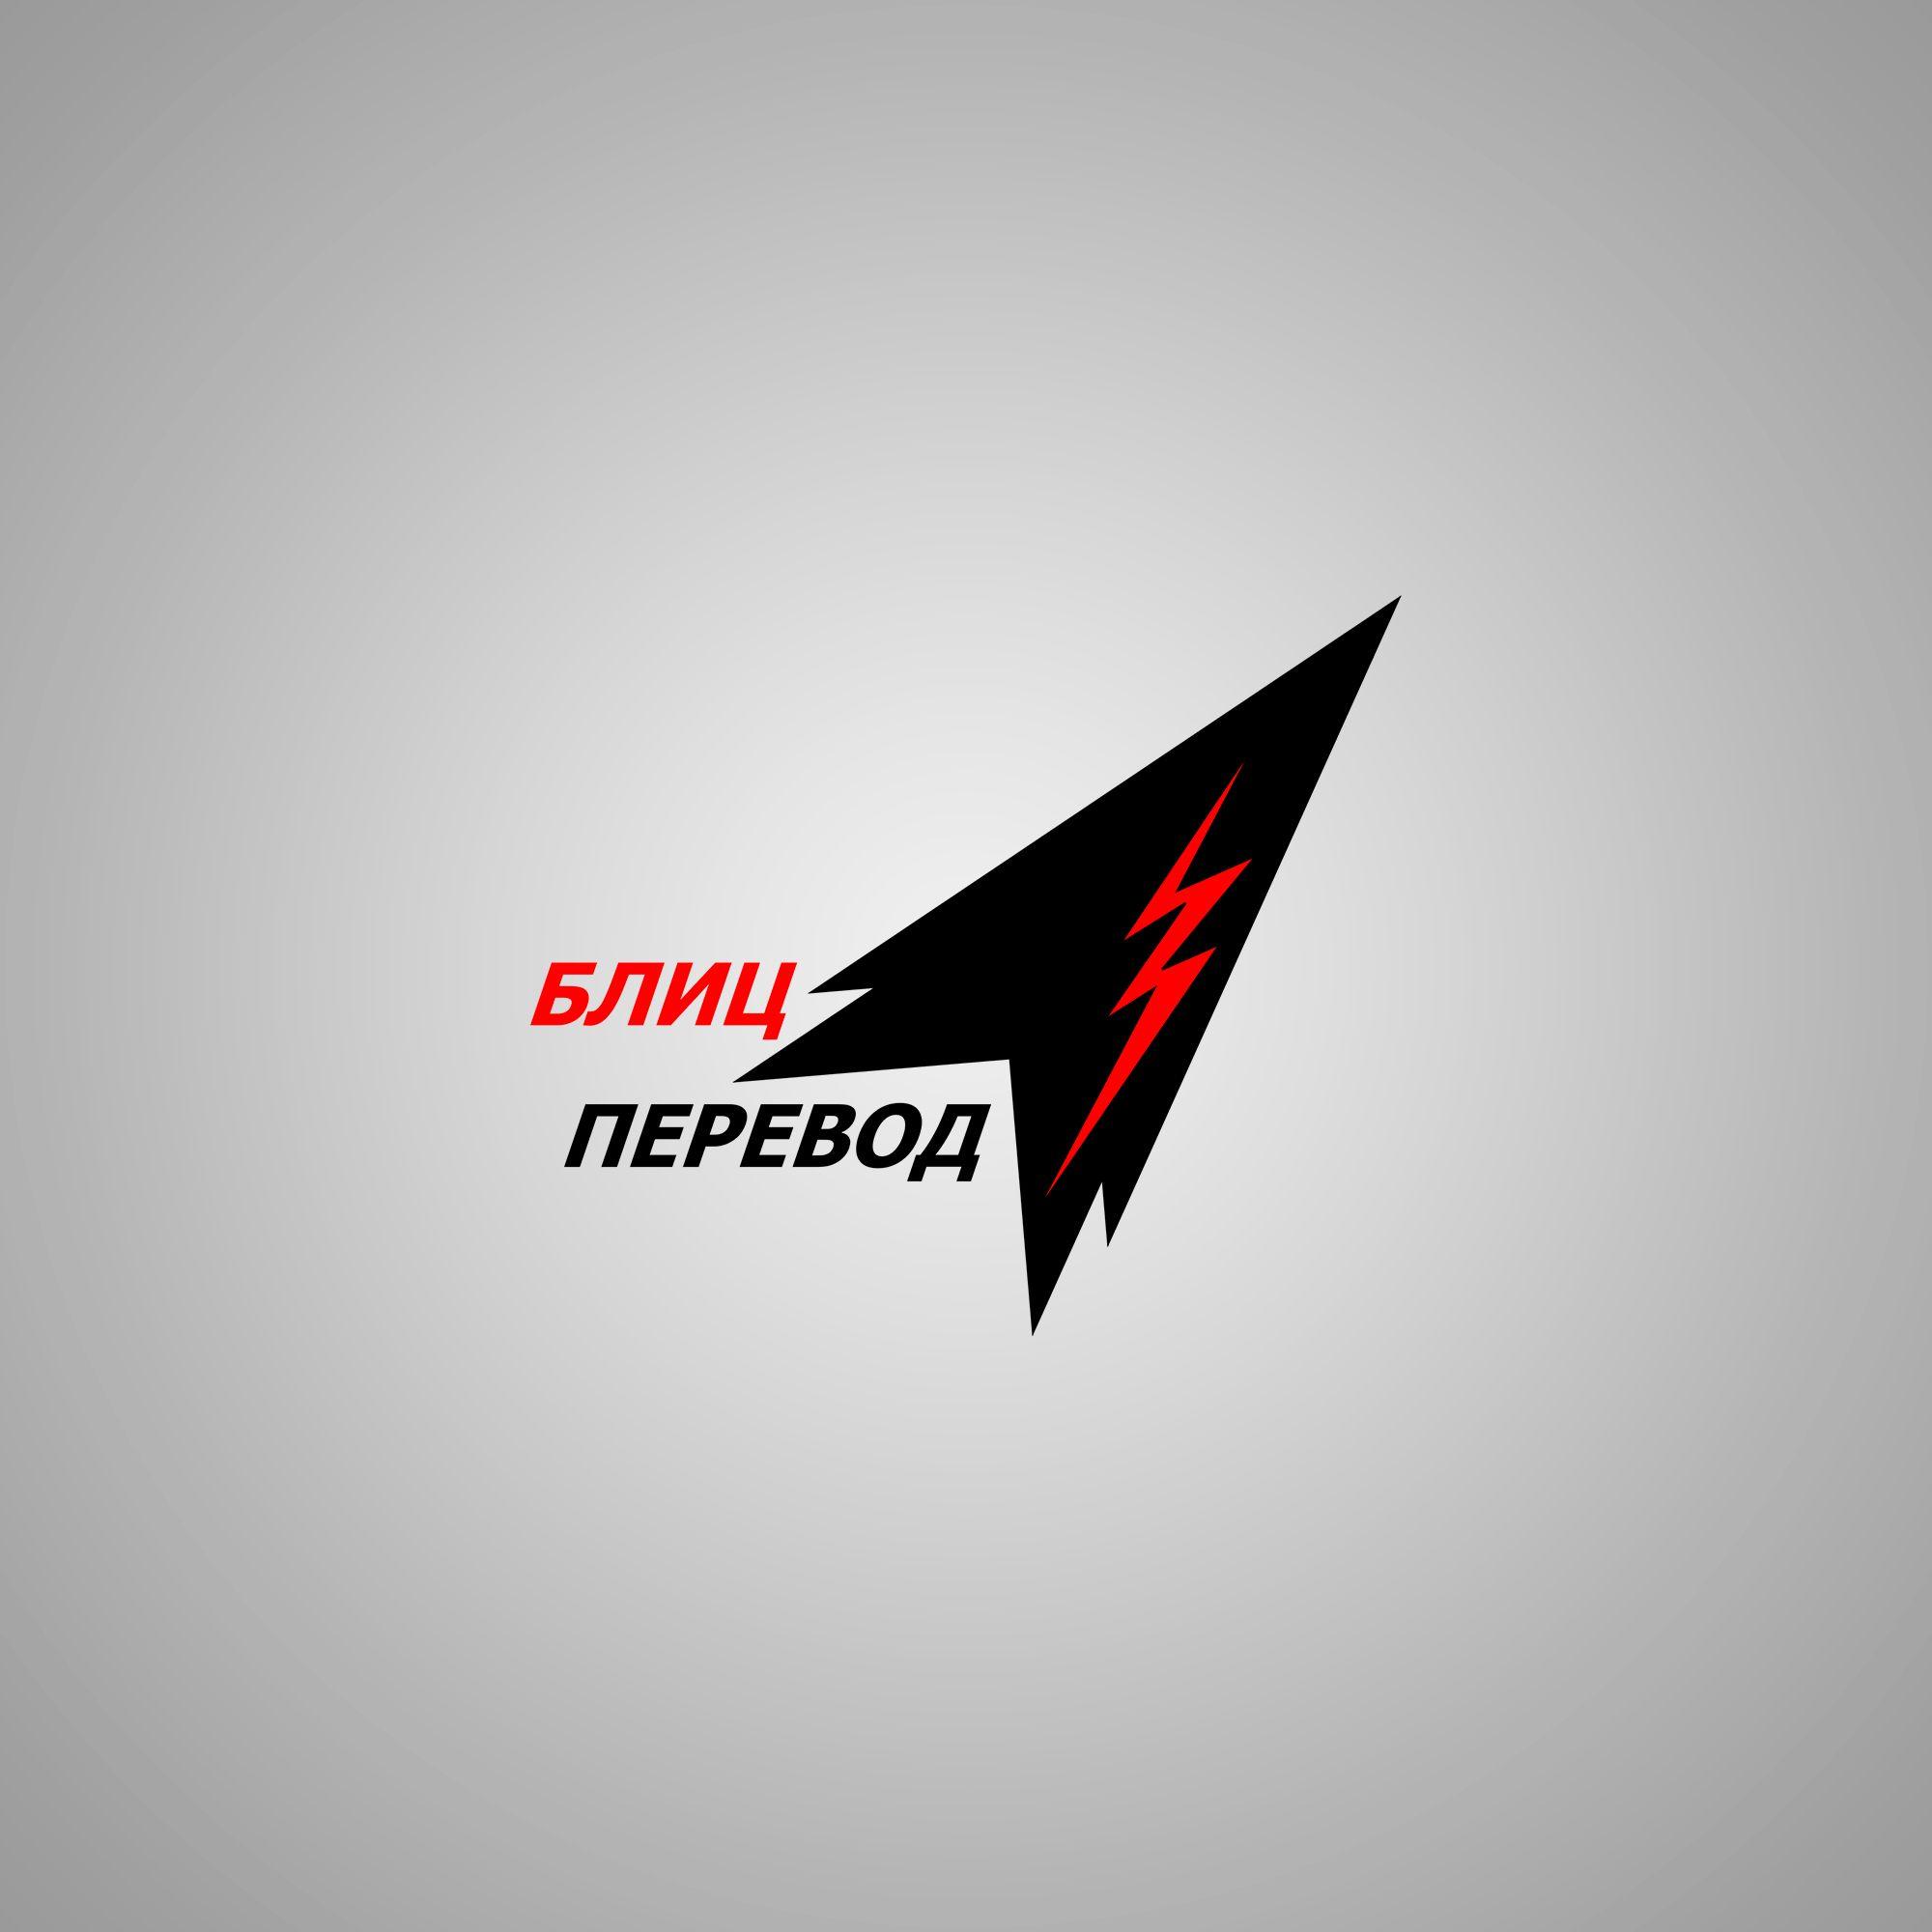 Логотип для бюро переводов